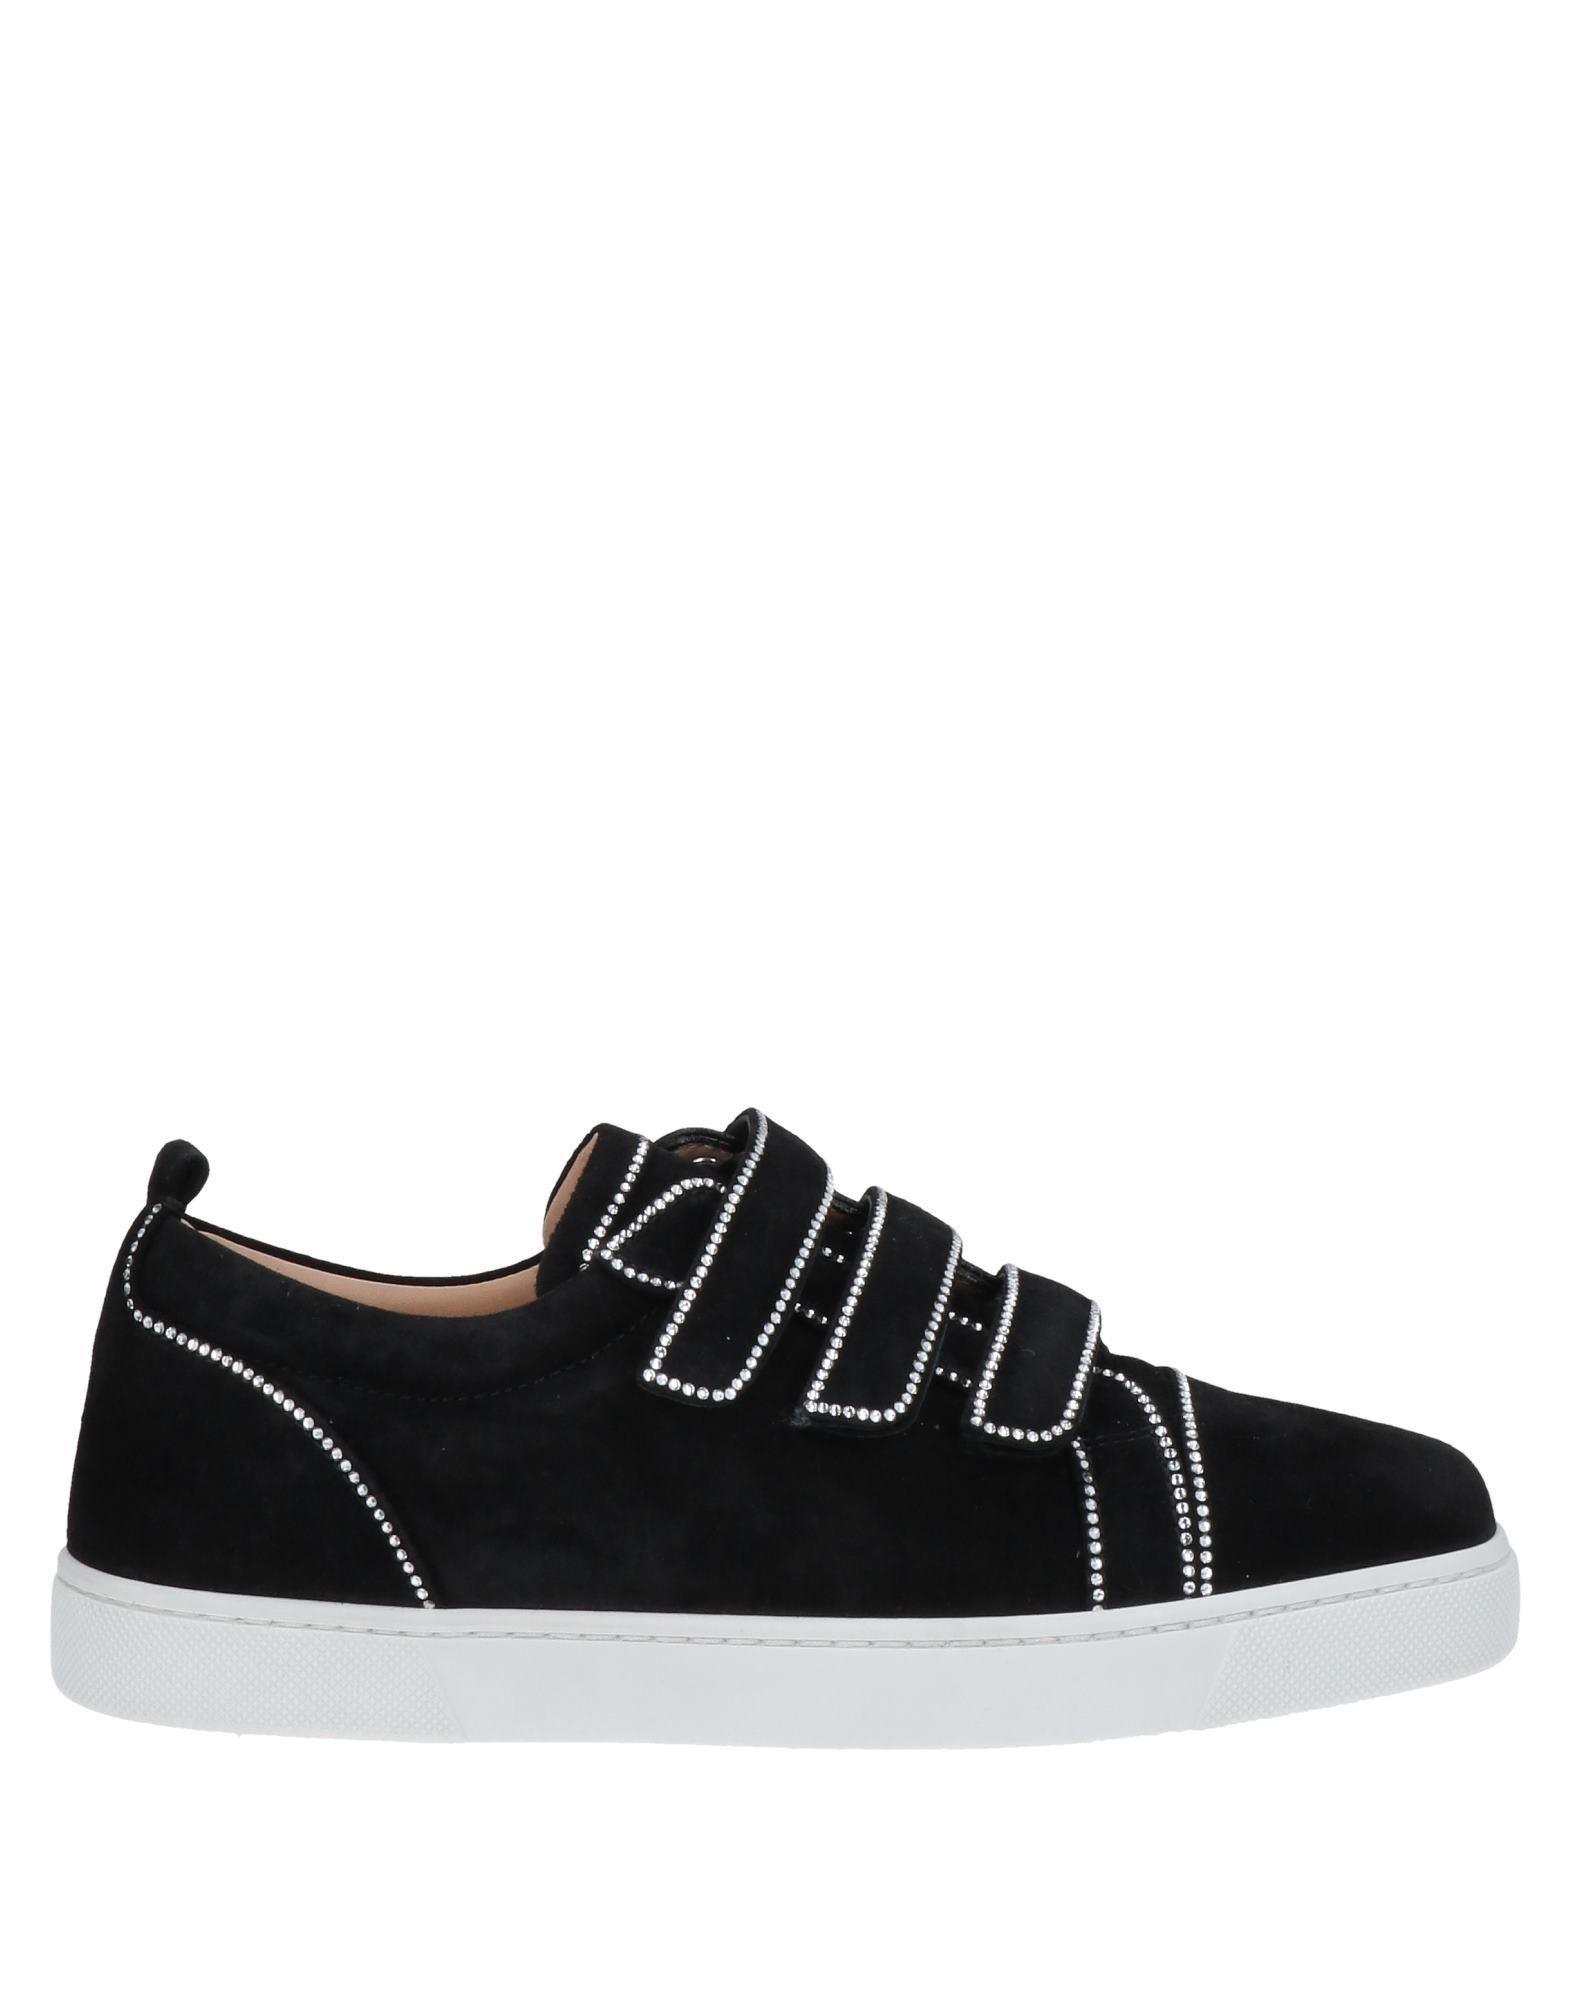 CHRISTIAN LOUBOUTIN Low-tops & sneakers - Item 17044885